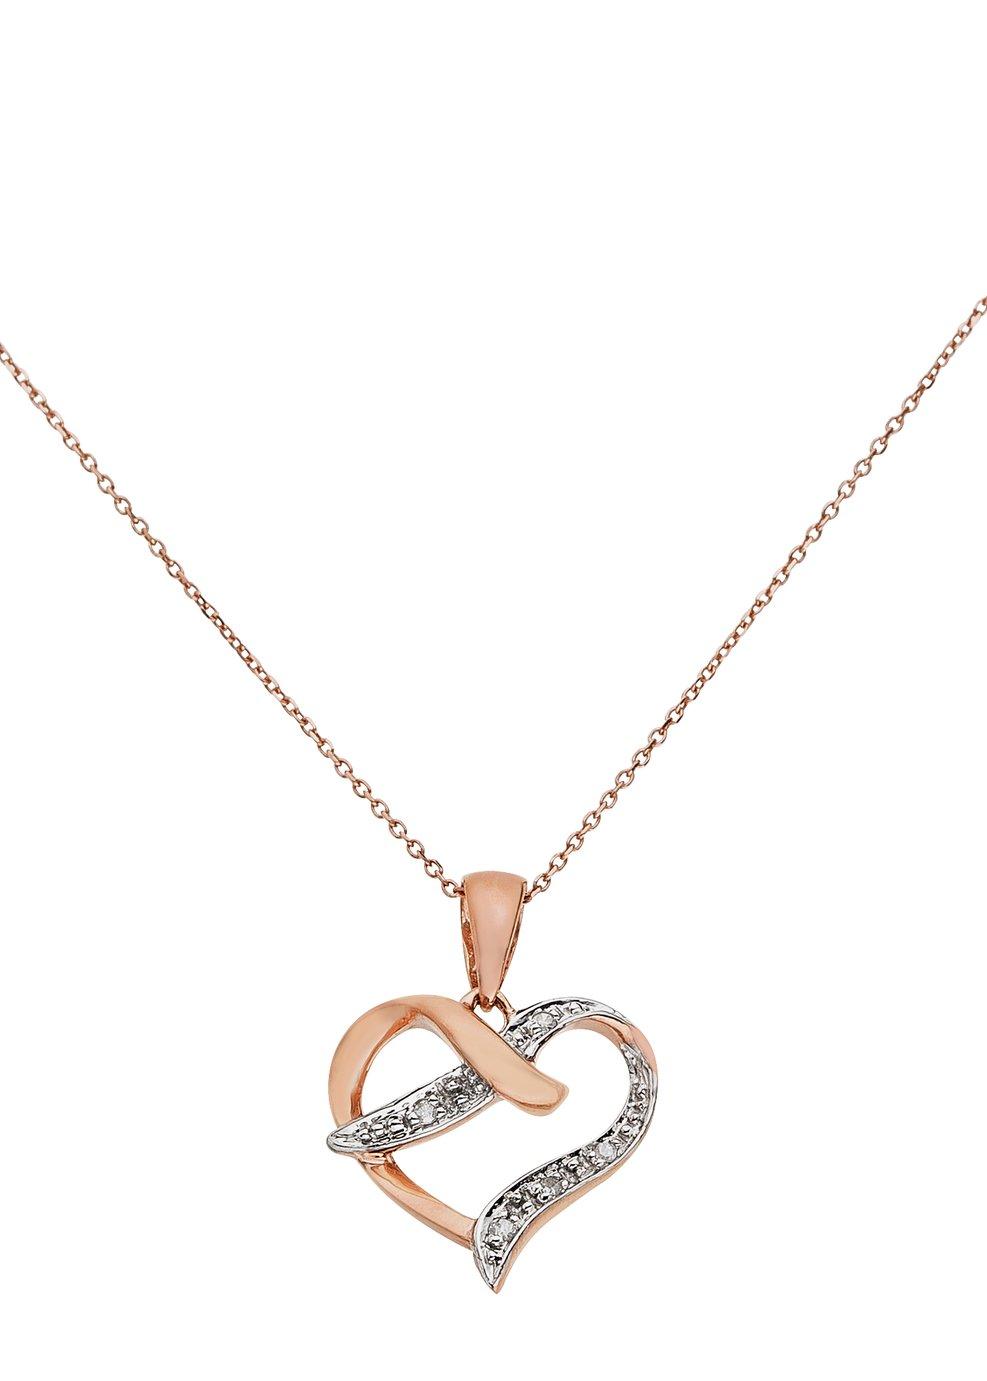 Revere 9ct Rose Gold Diamond Accent Pendant 18 Inch Necklace